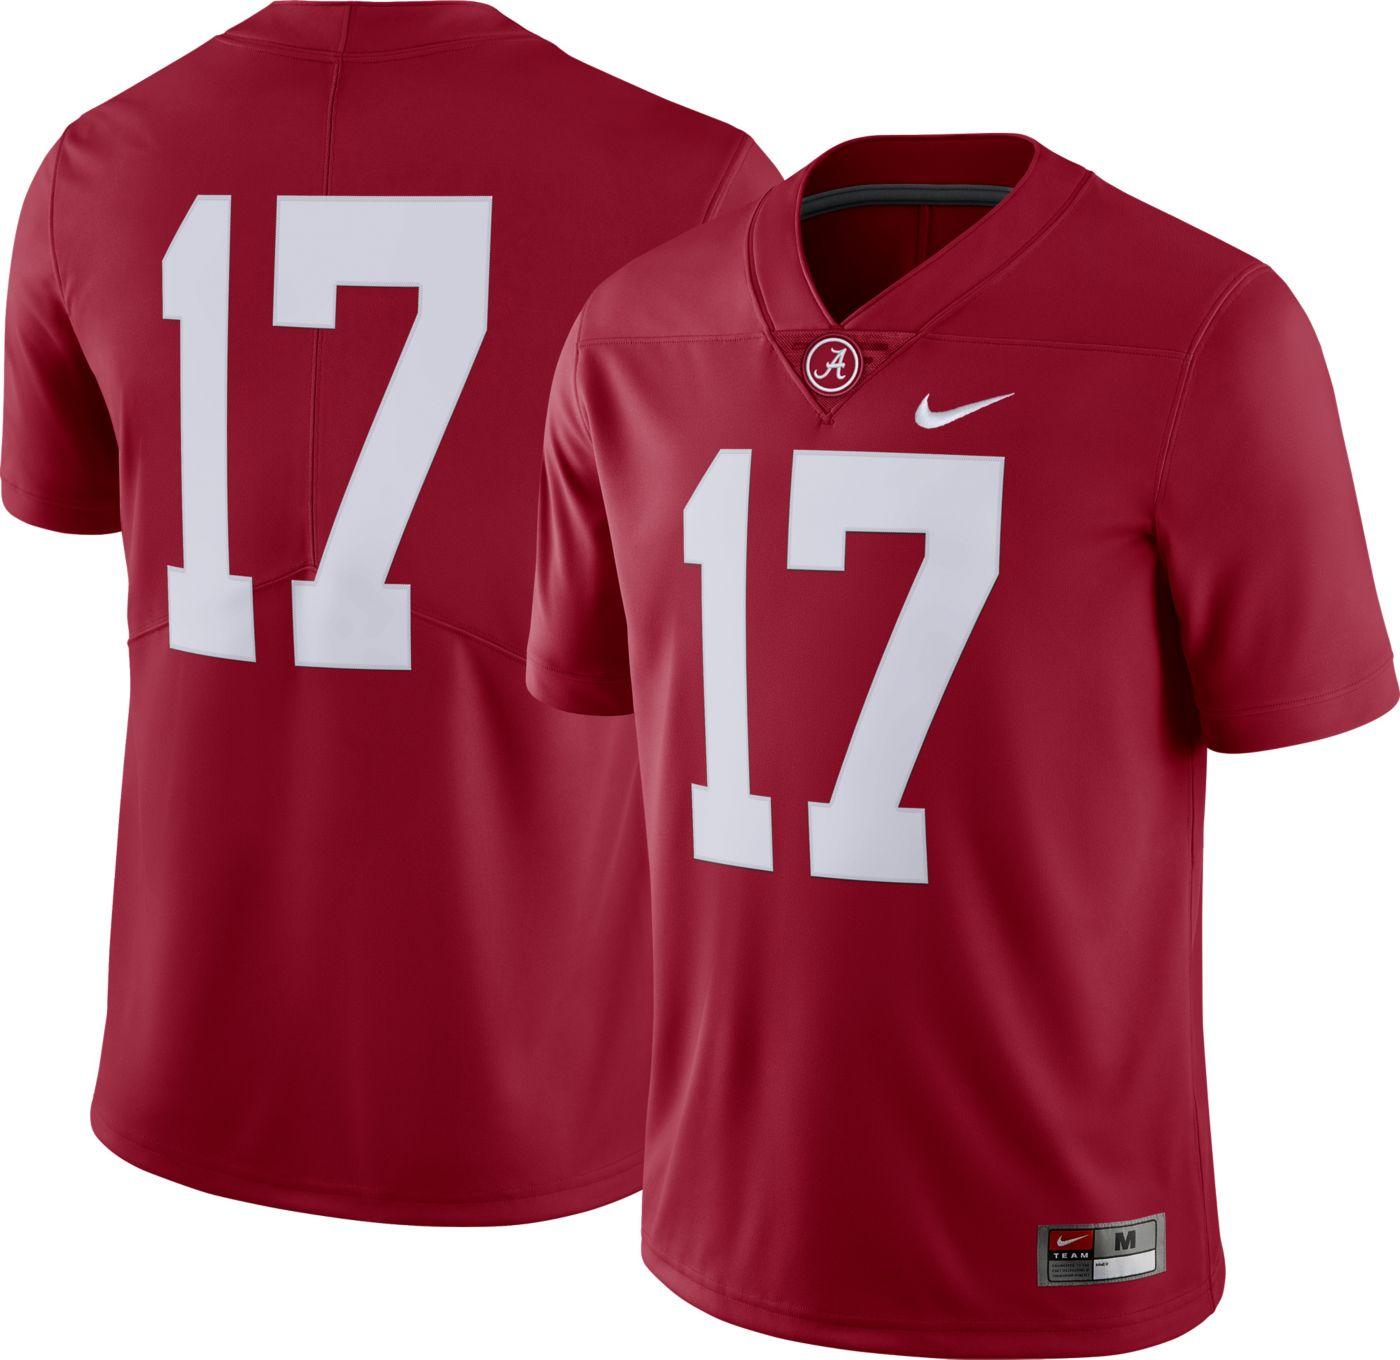 Nike Men's Alabama Crimson Tide #17 Crimson Dri-FIT Limited Football Jersey